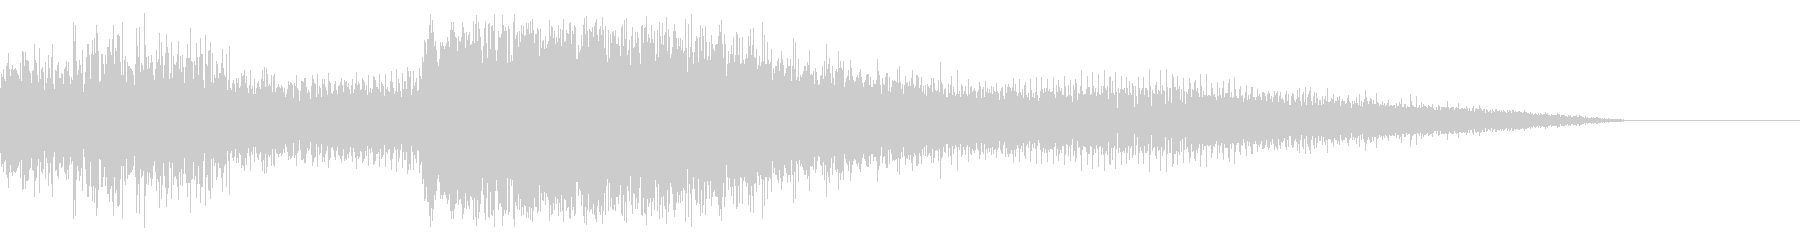 SynthSweep EC03_34_3の未再生の波形